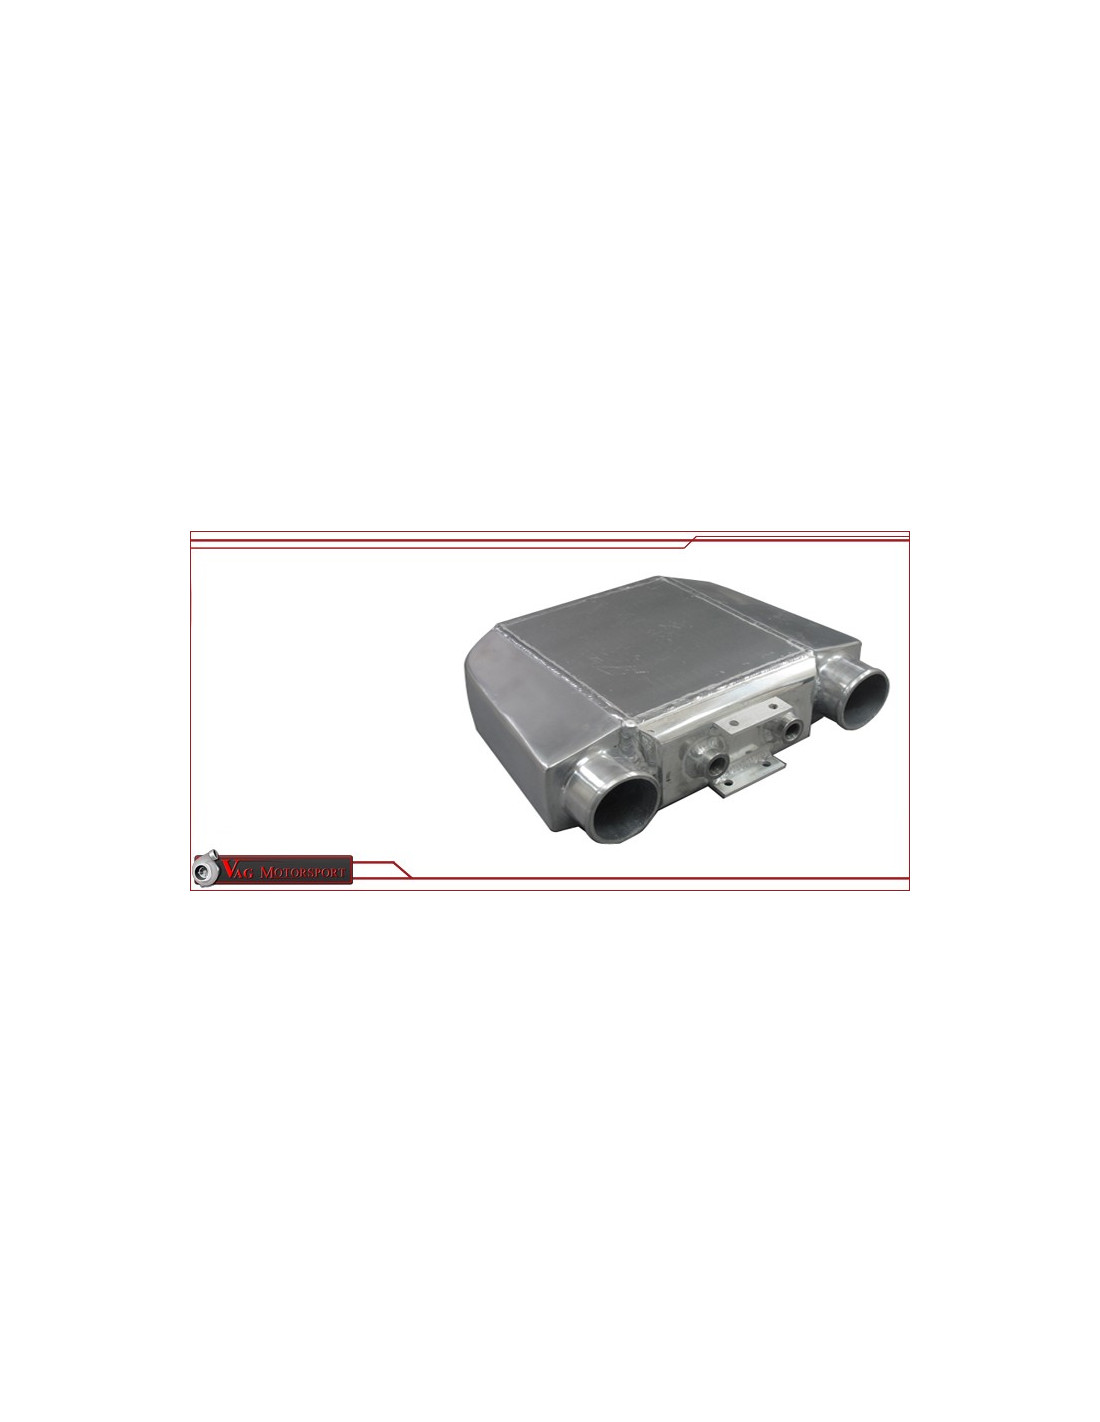 intercooler changeur air eau type4. Black Bedroom Furniture Sets. Home Design Ideas